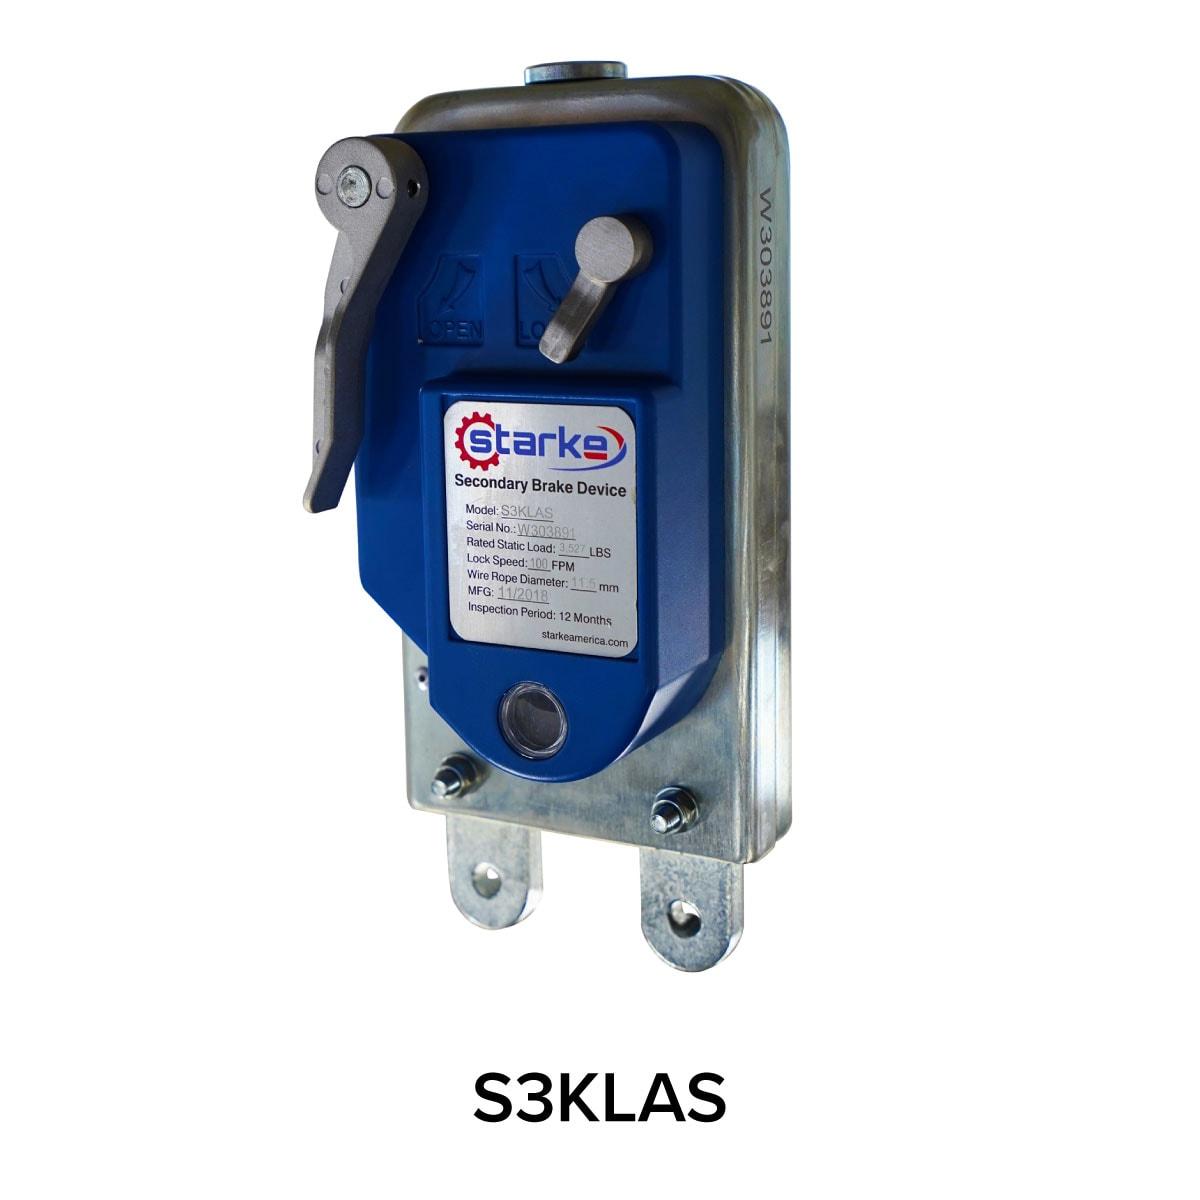 Starke Secondary Brake Device S3KLAS